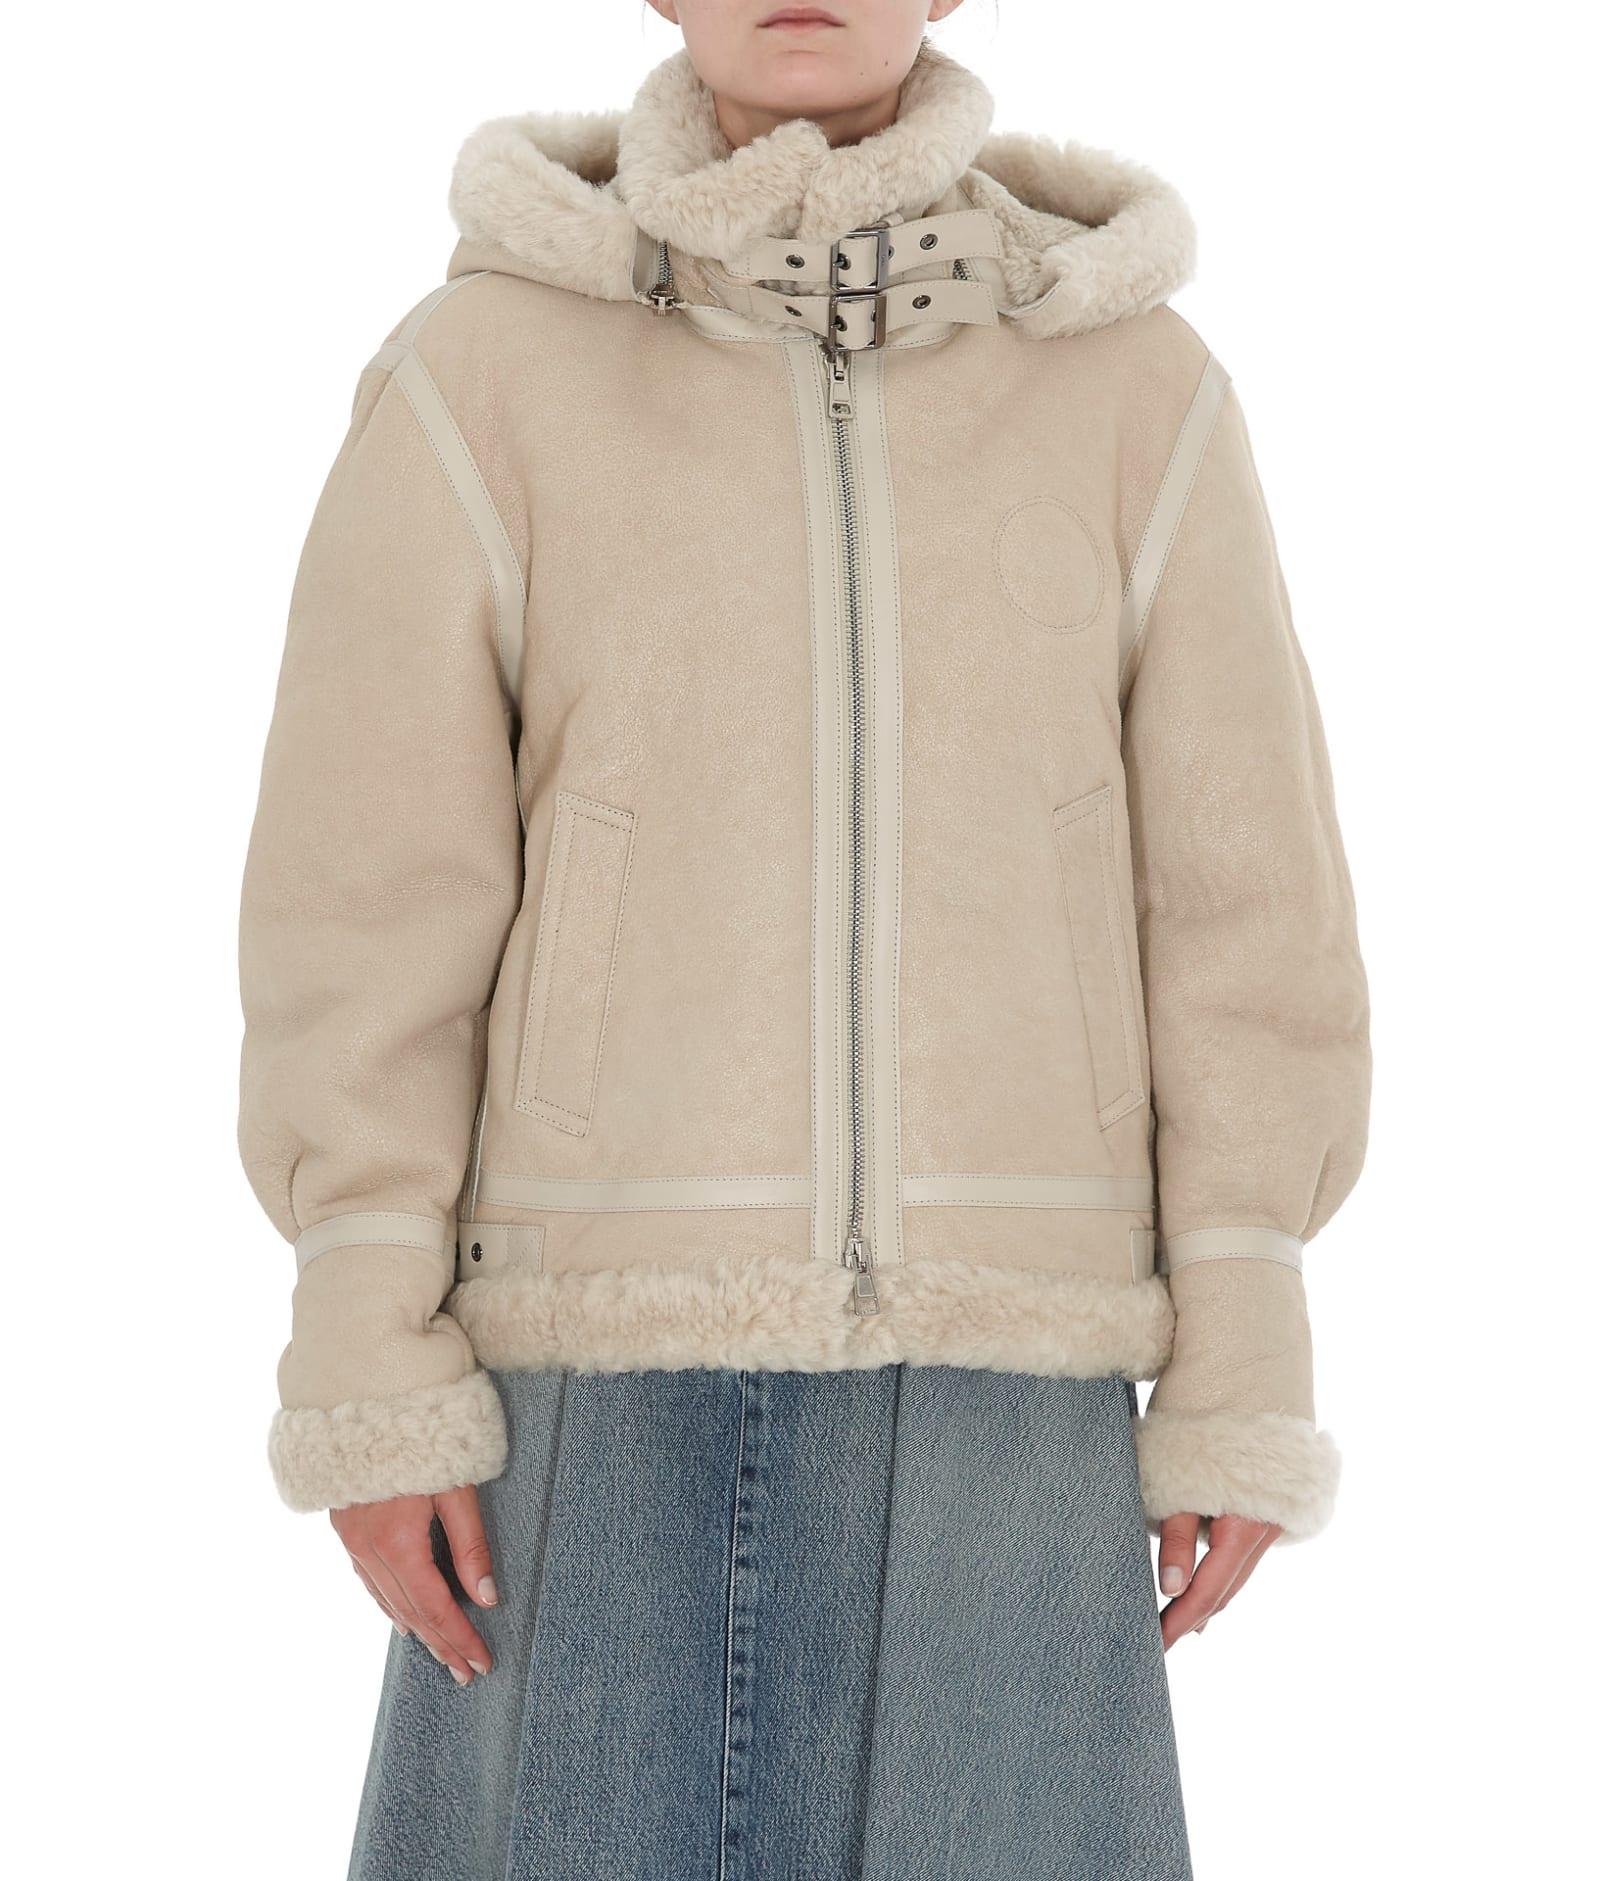 Chloé Aviator Jacket